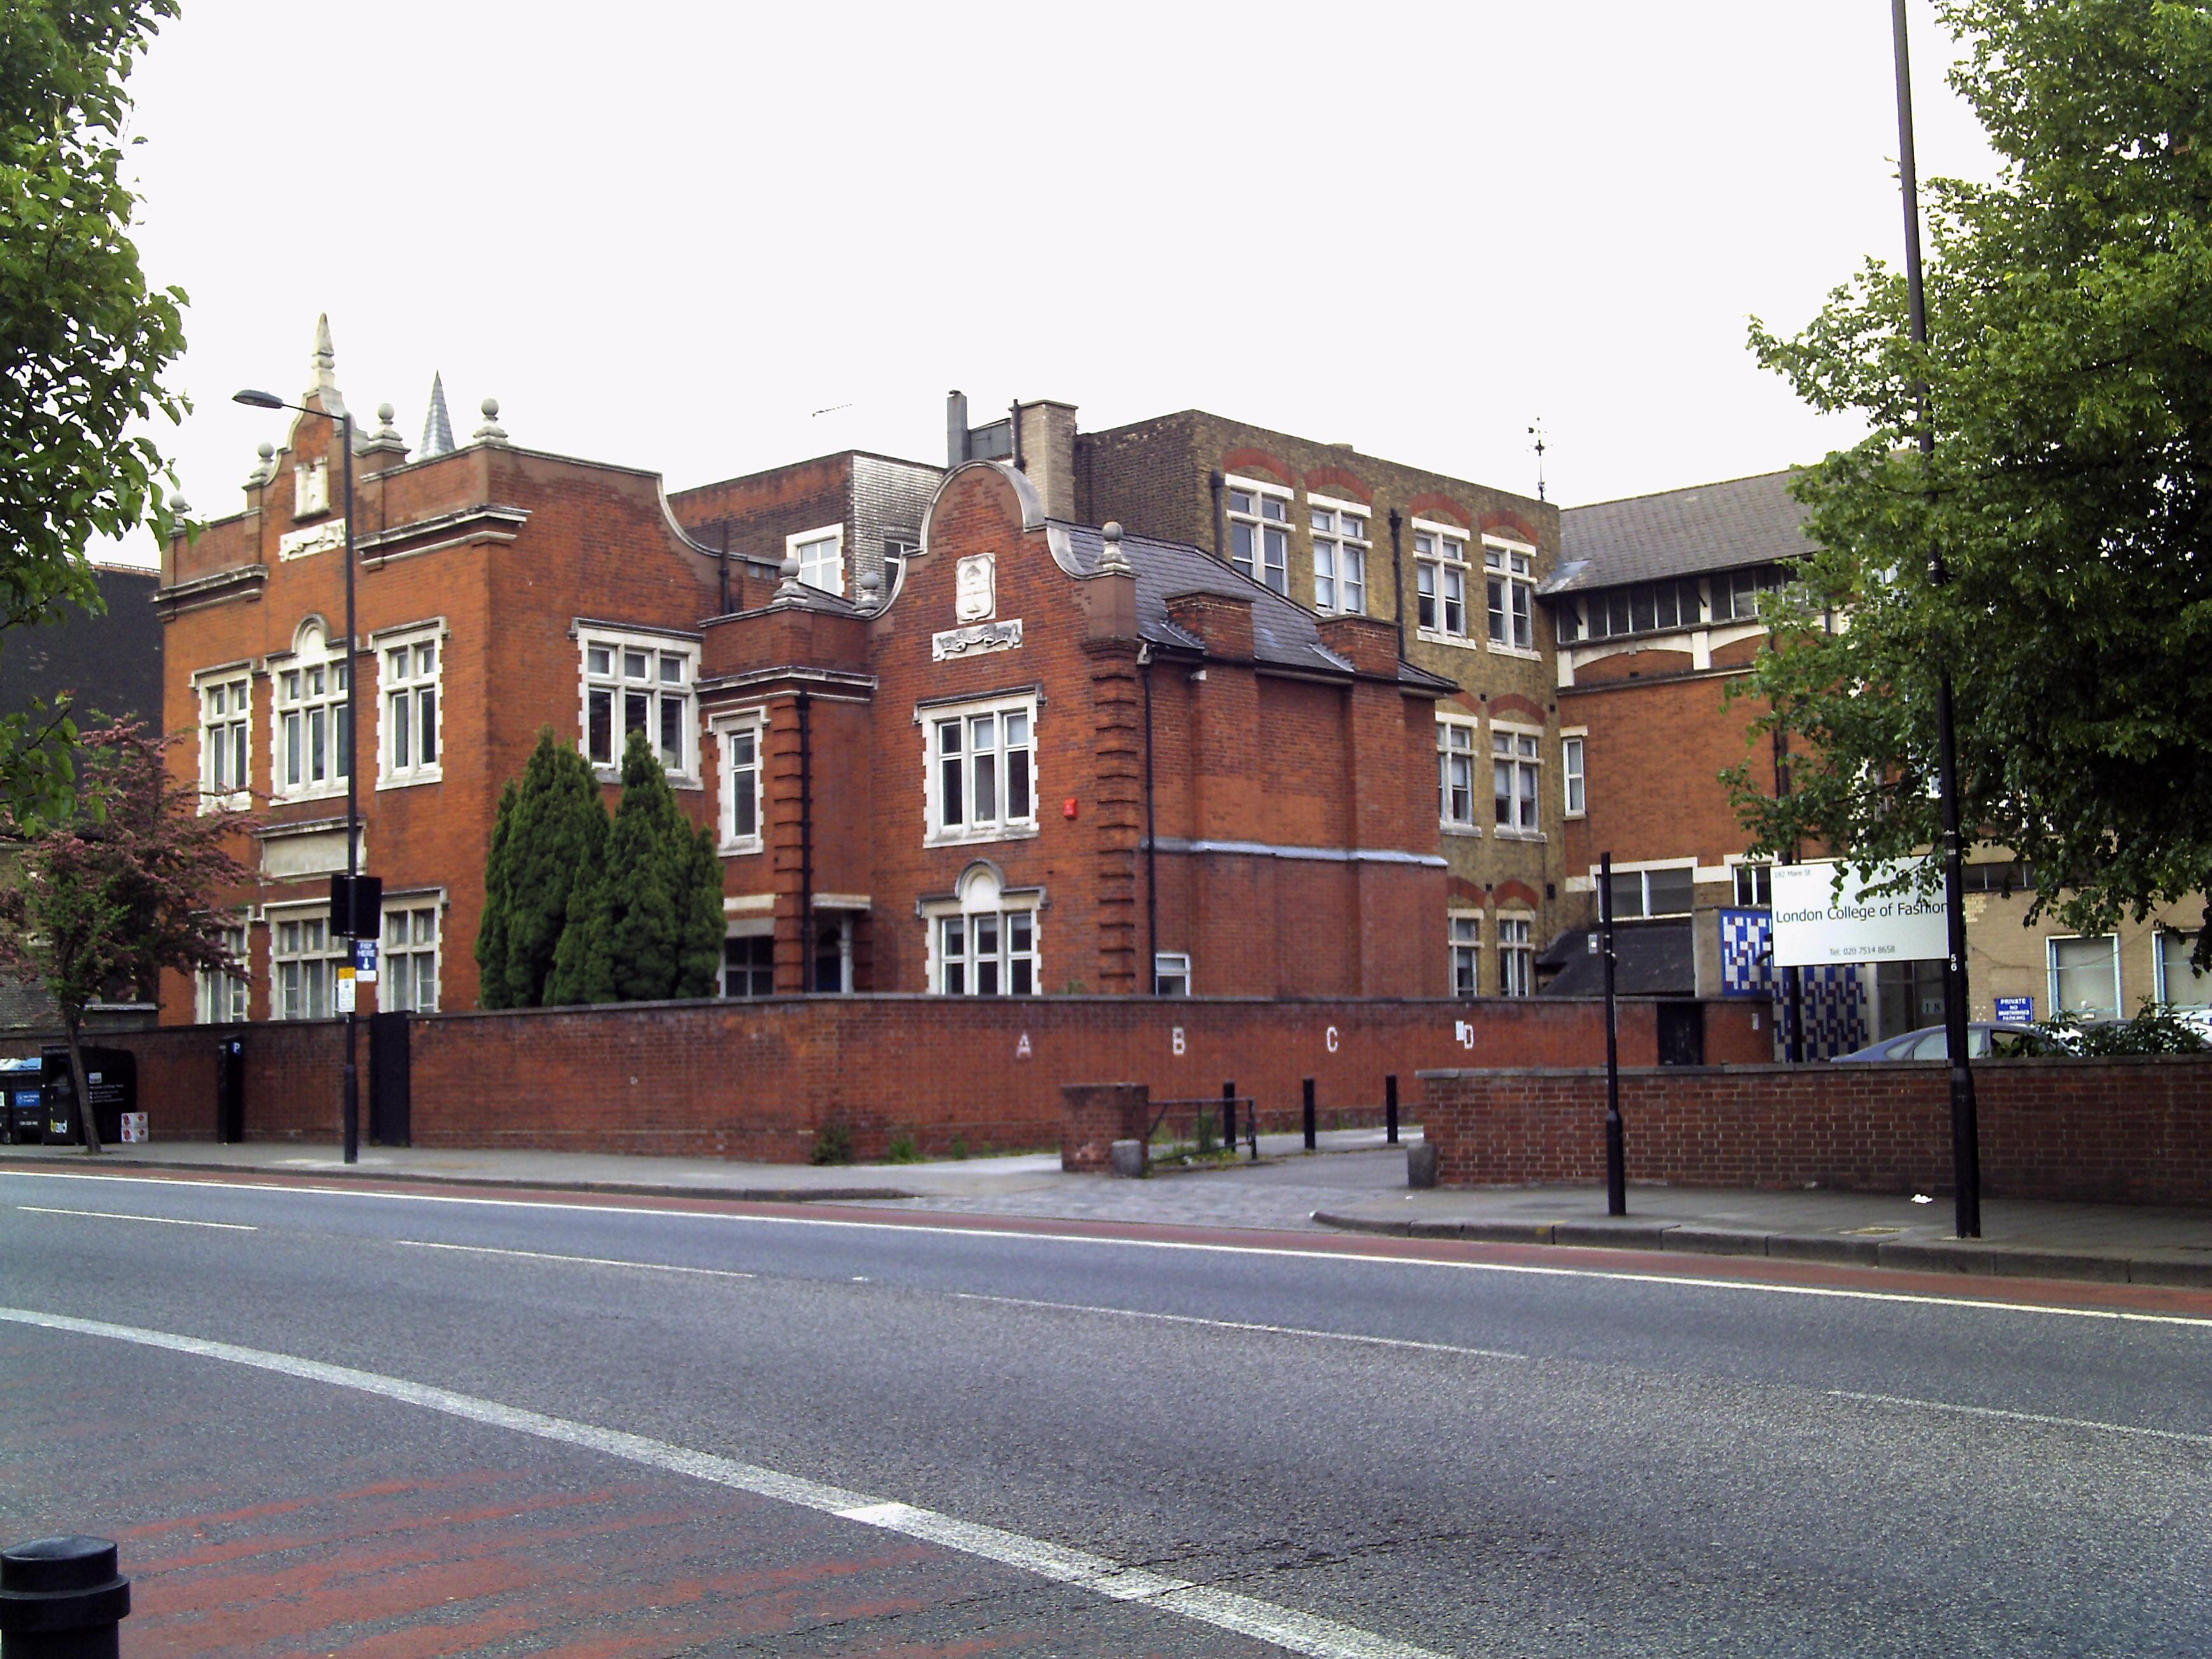 London technology college